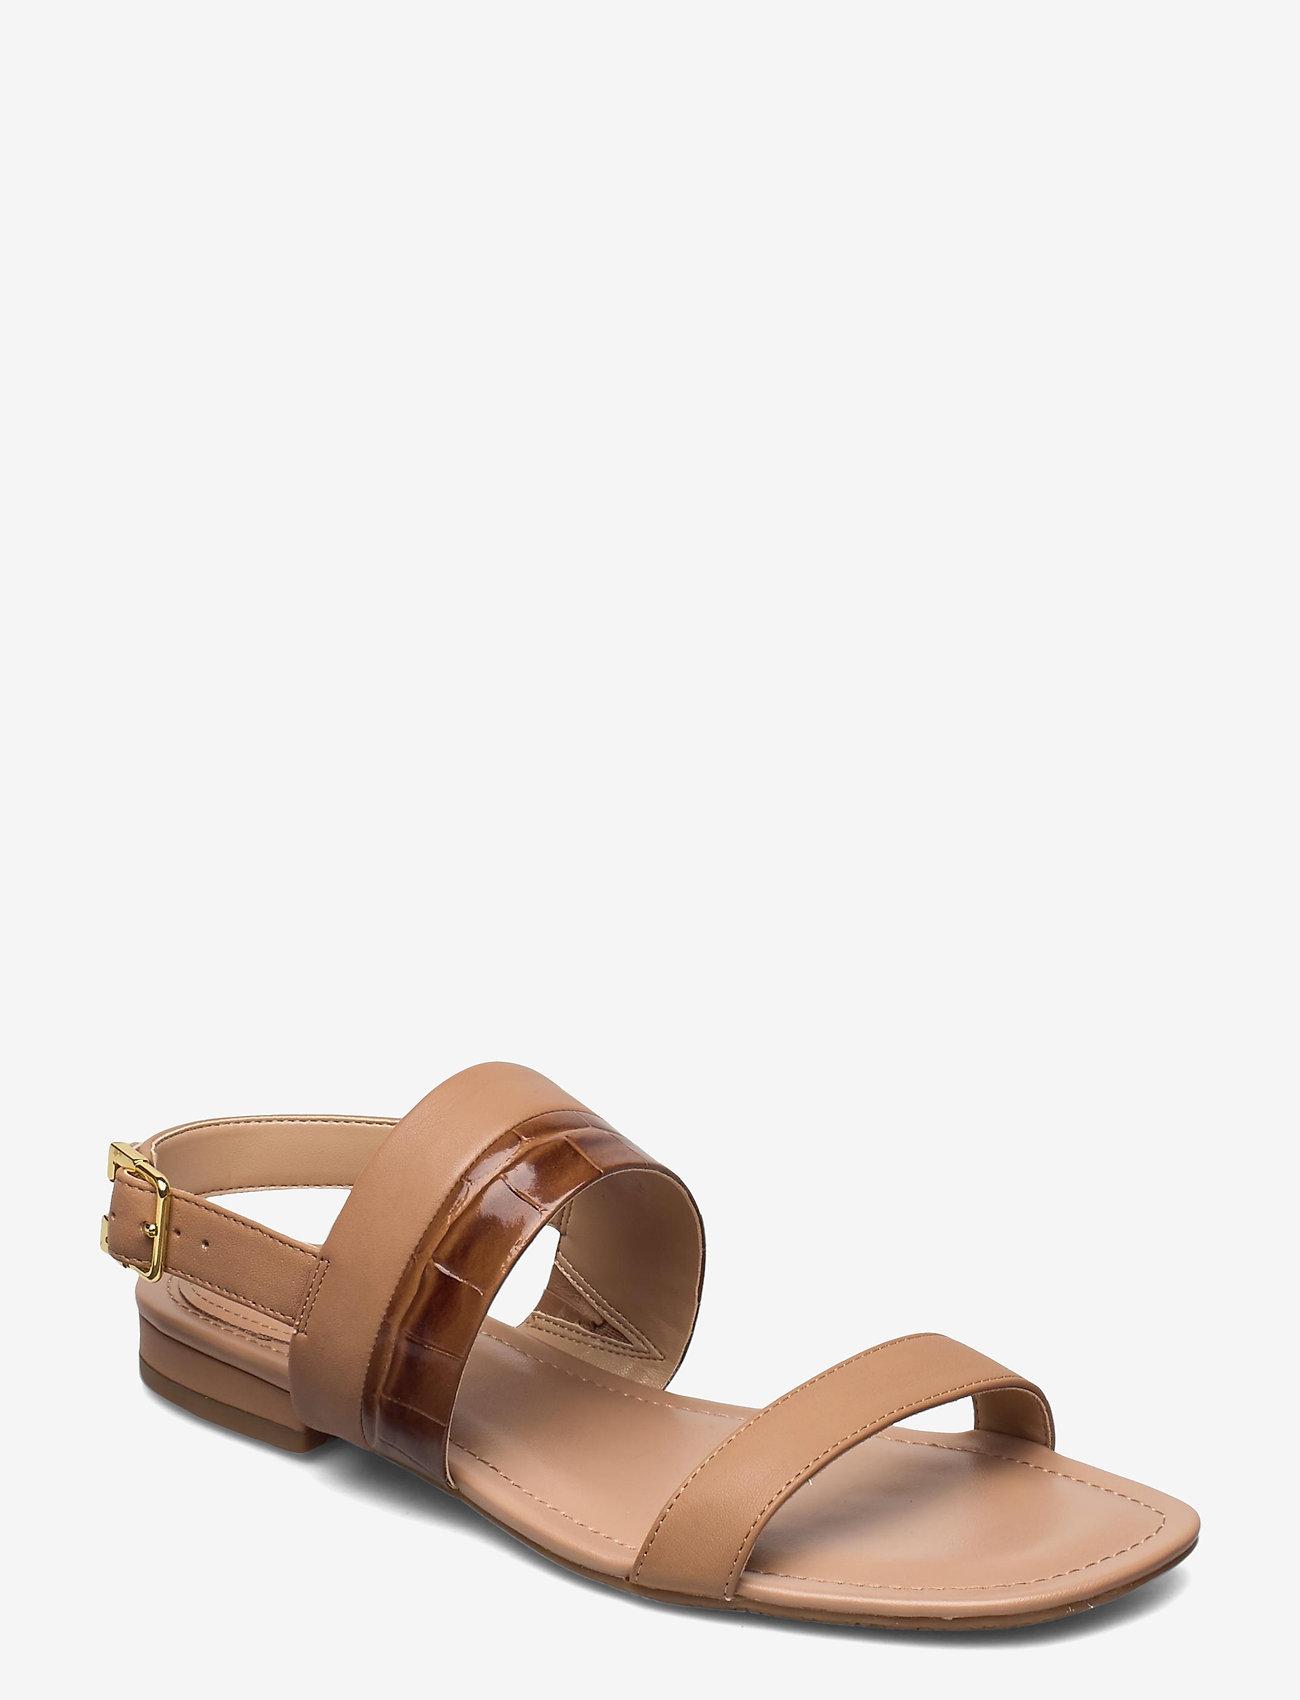 Lauren Ralph Lauren - Kristi Embossed Nappa Leather Sandal - flade sandaler - nude/deep saddle - 0